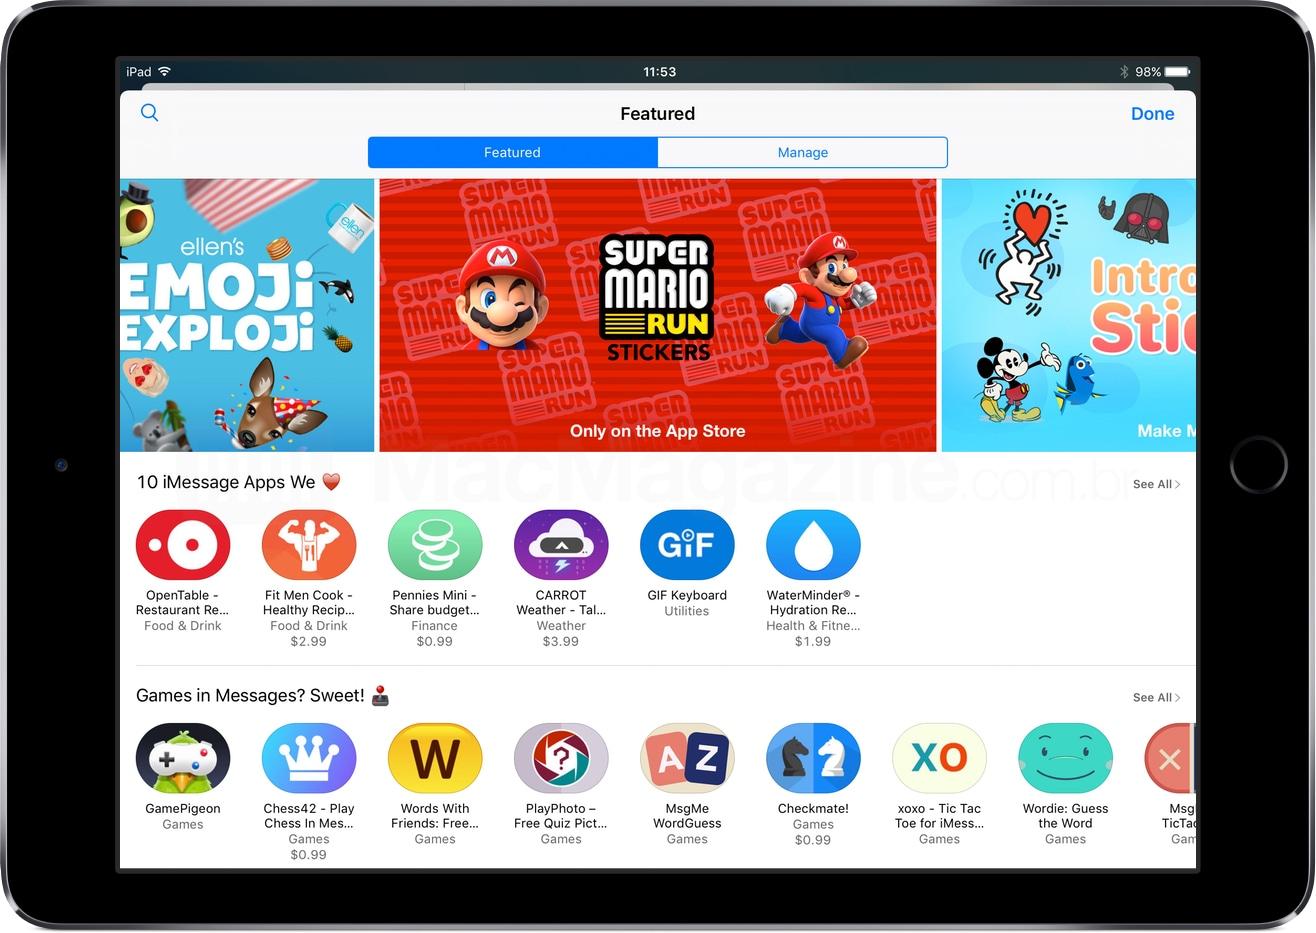 App Store do iMessage